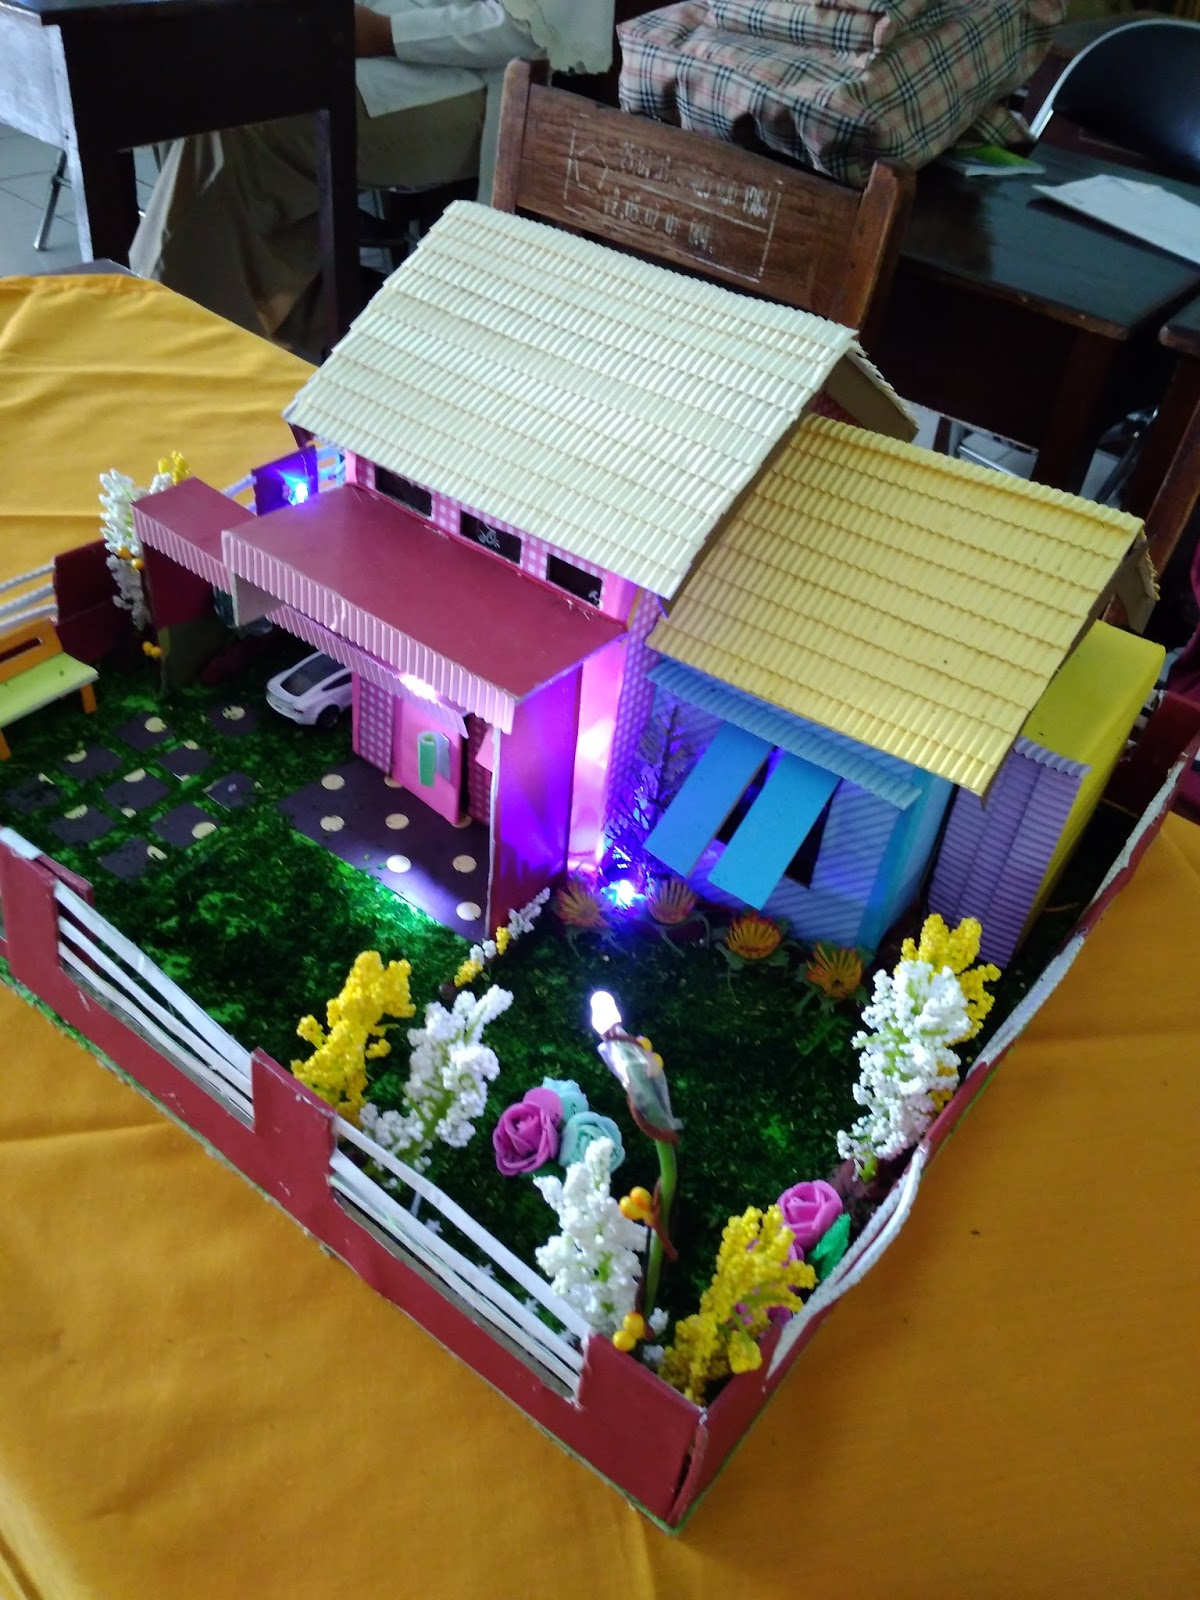 Miniatur Rumah Minimalis Dari Styrofoam : miniatur, rumah, minimalis, styrofoam, Membuat, Miniatur, Rumah, Minimalis, Model